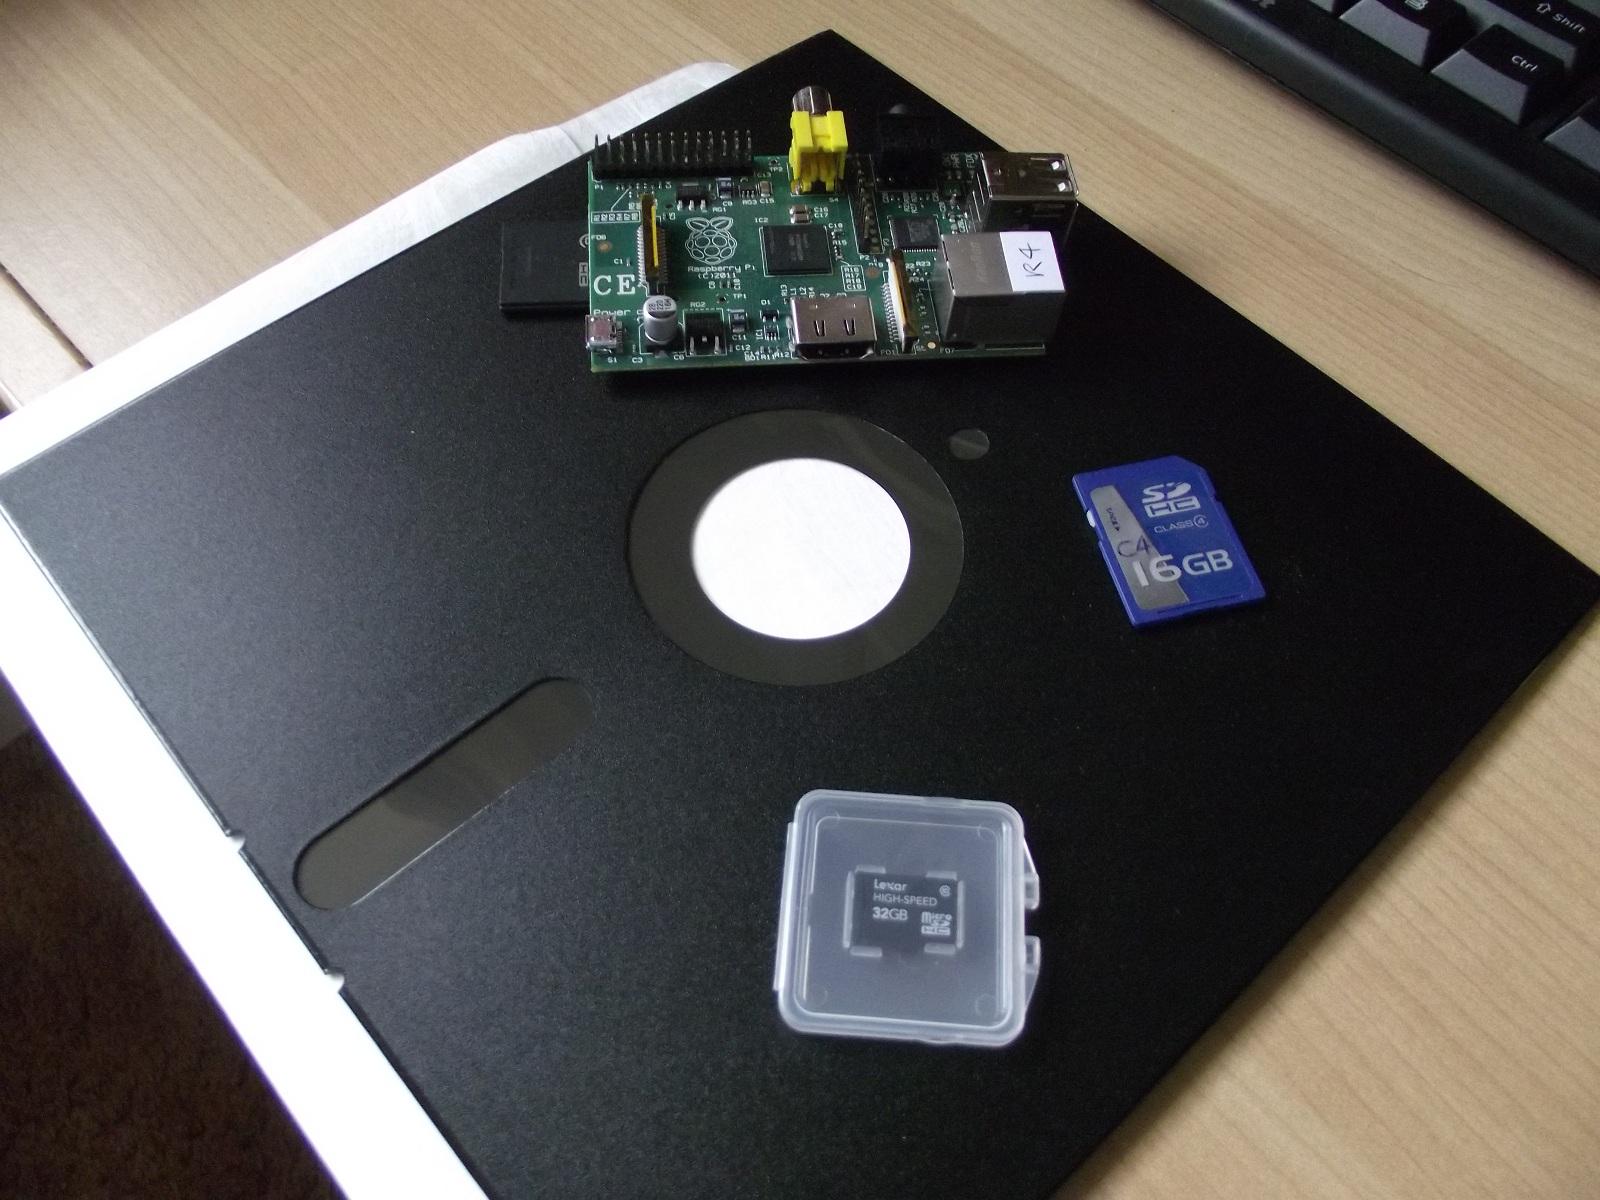 R4_Eight_Inch_Floppy.jpg